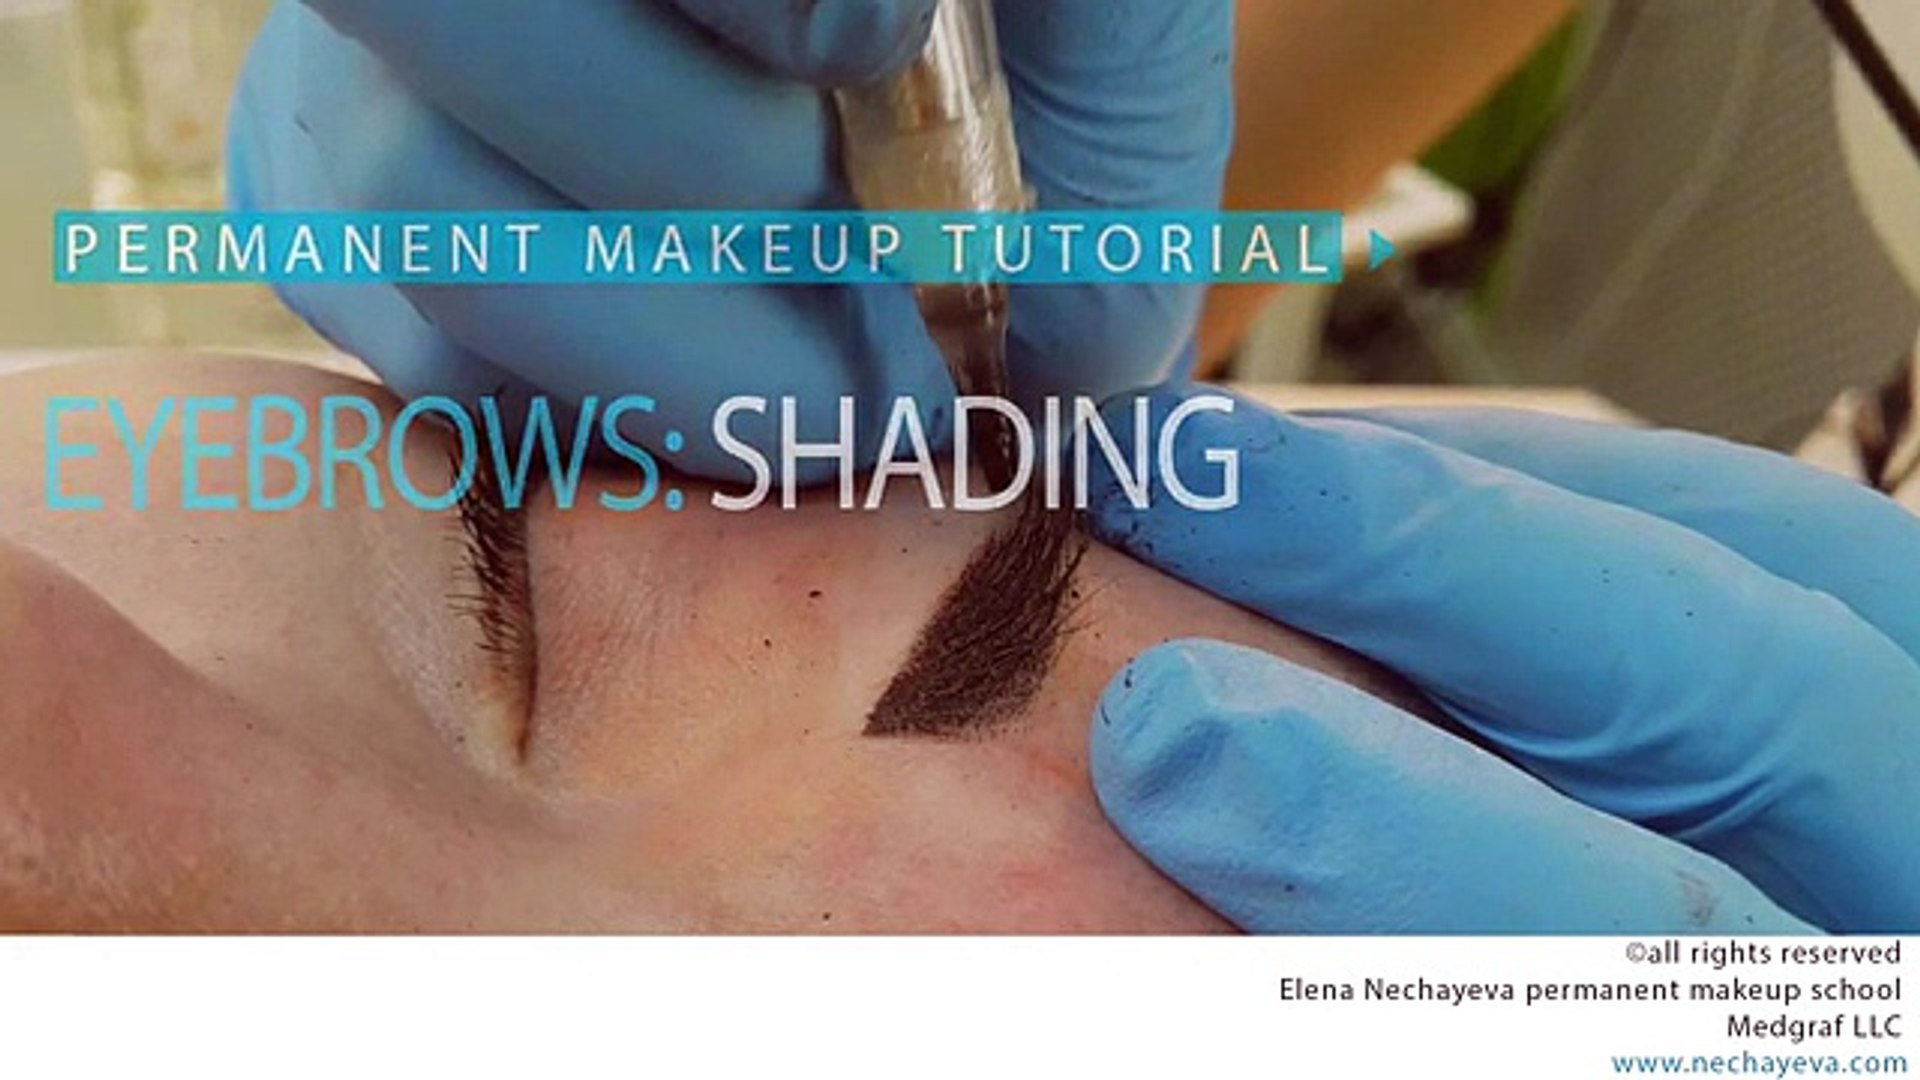 Permanent Makeup Tutorial Eyebrows